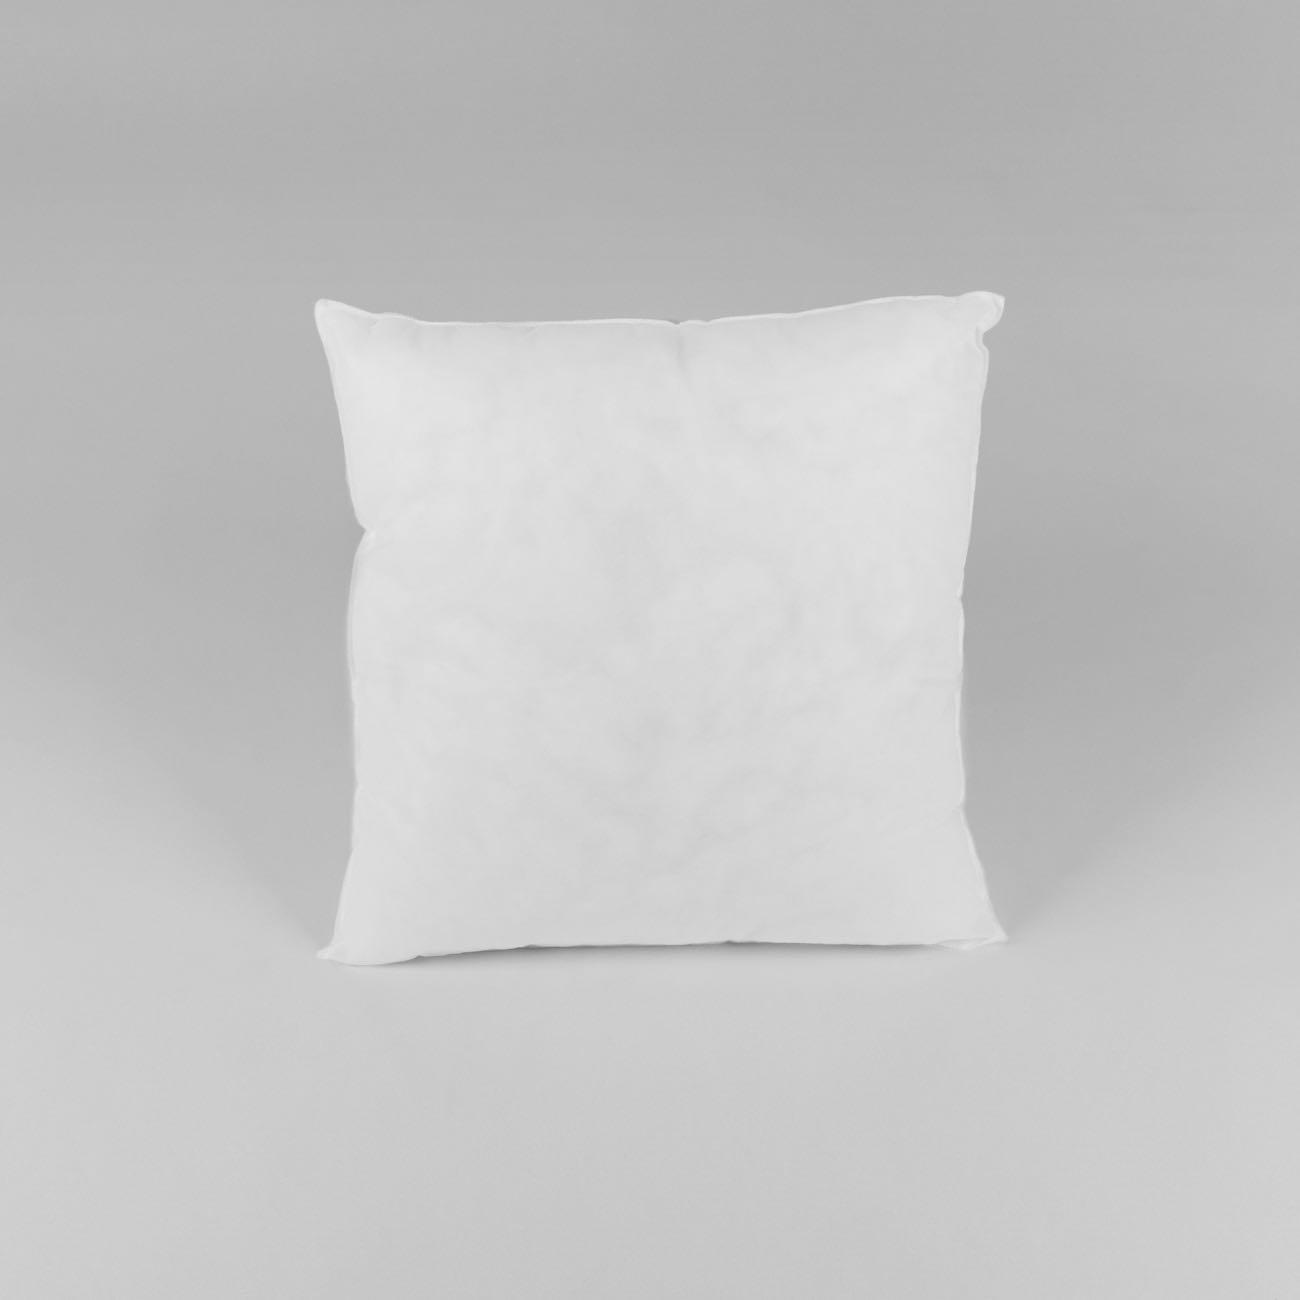 Enchimento Almofada 45x45 cm Branco Catherine Lansfield